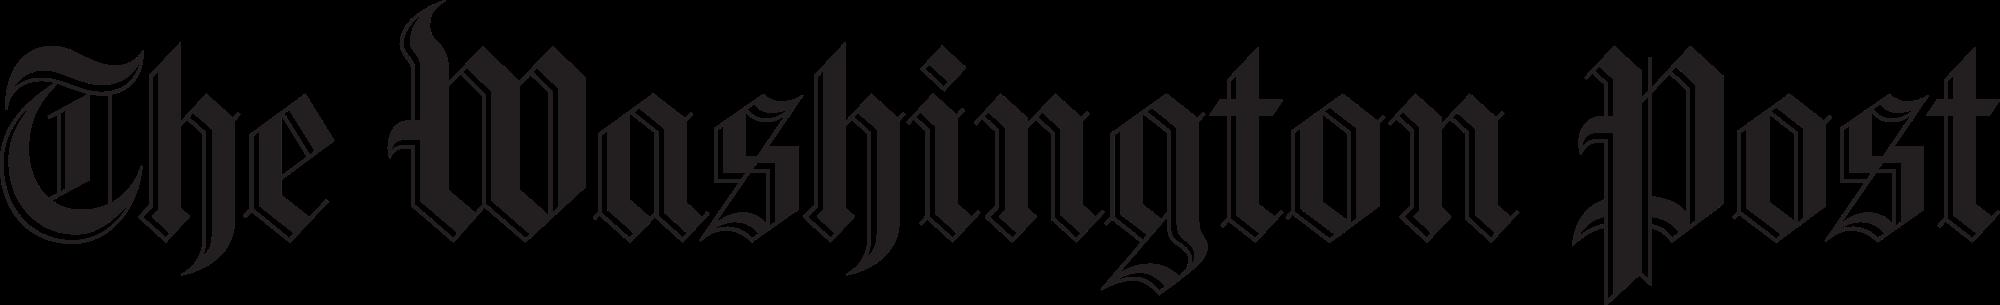 the washington press logo.png